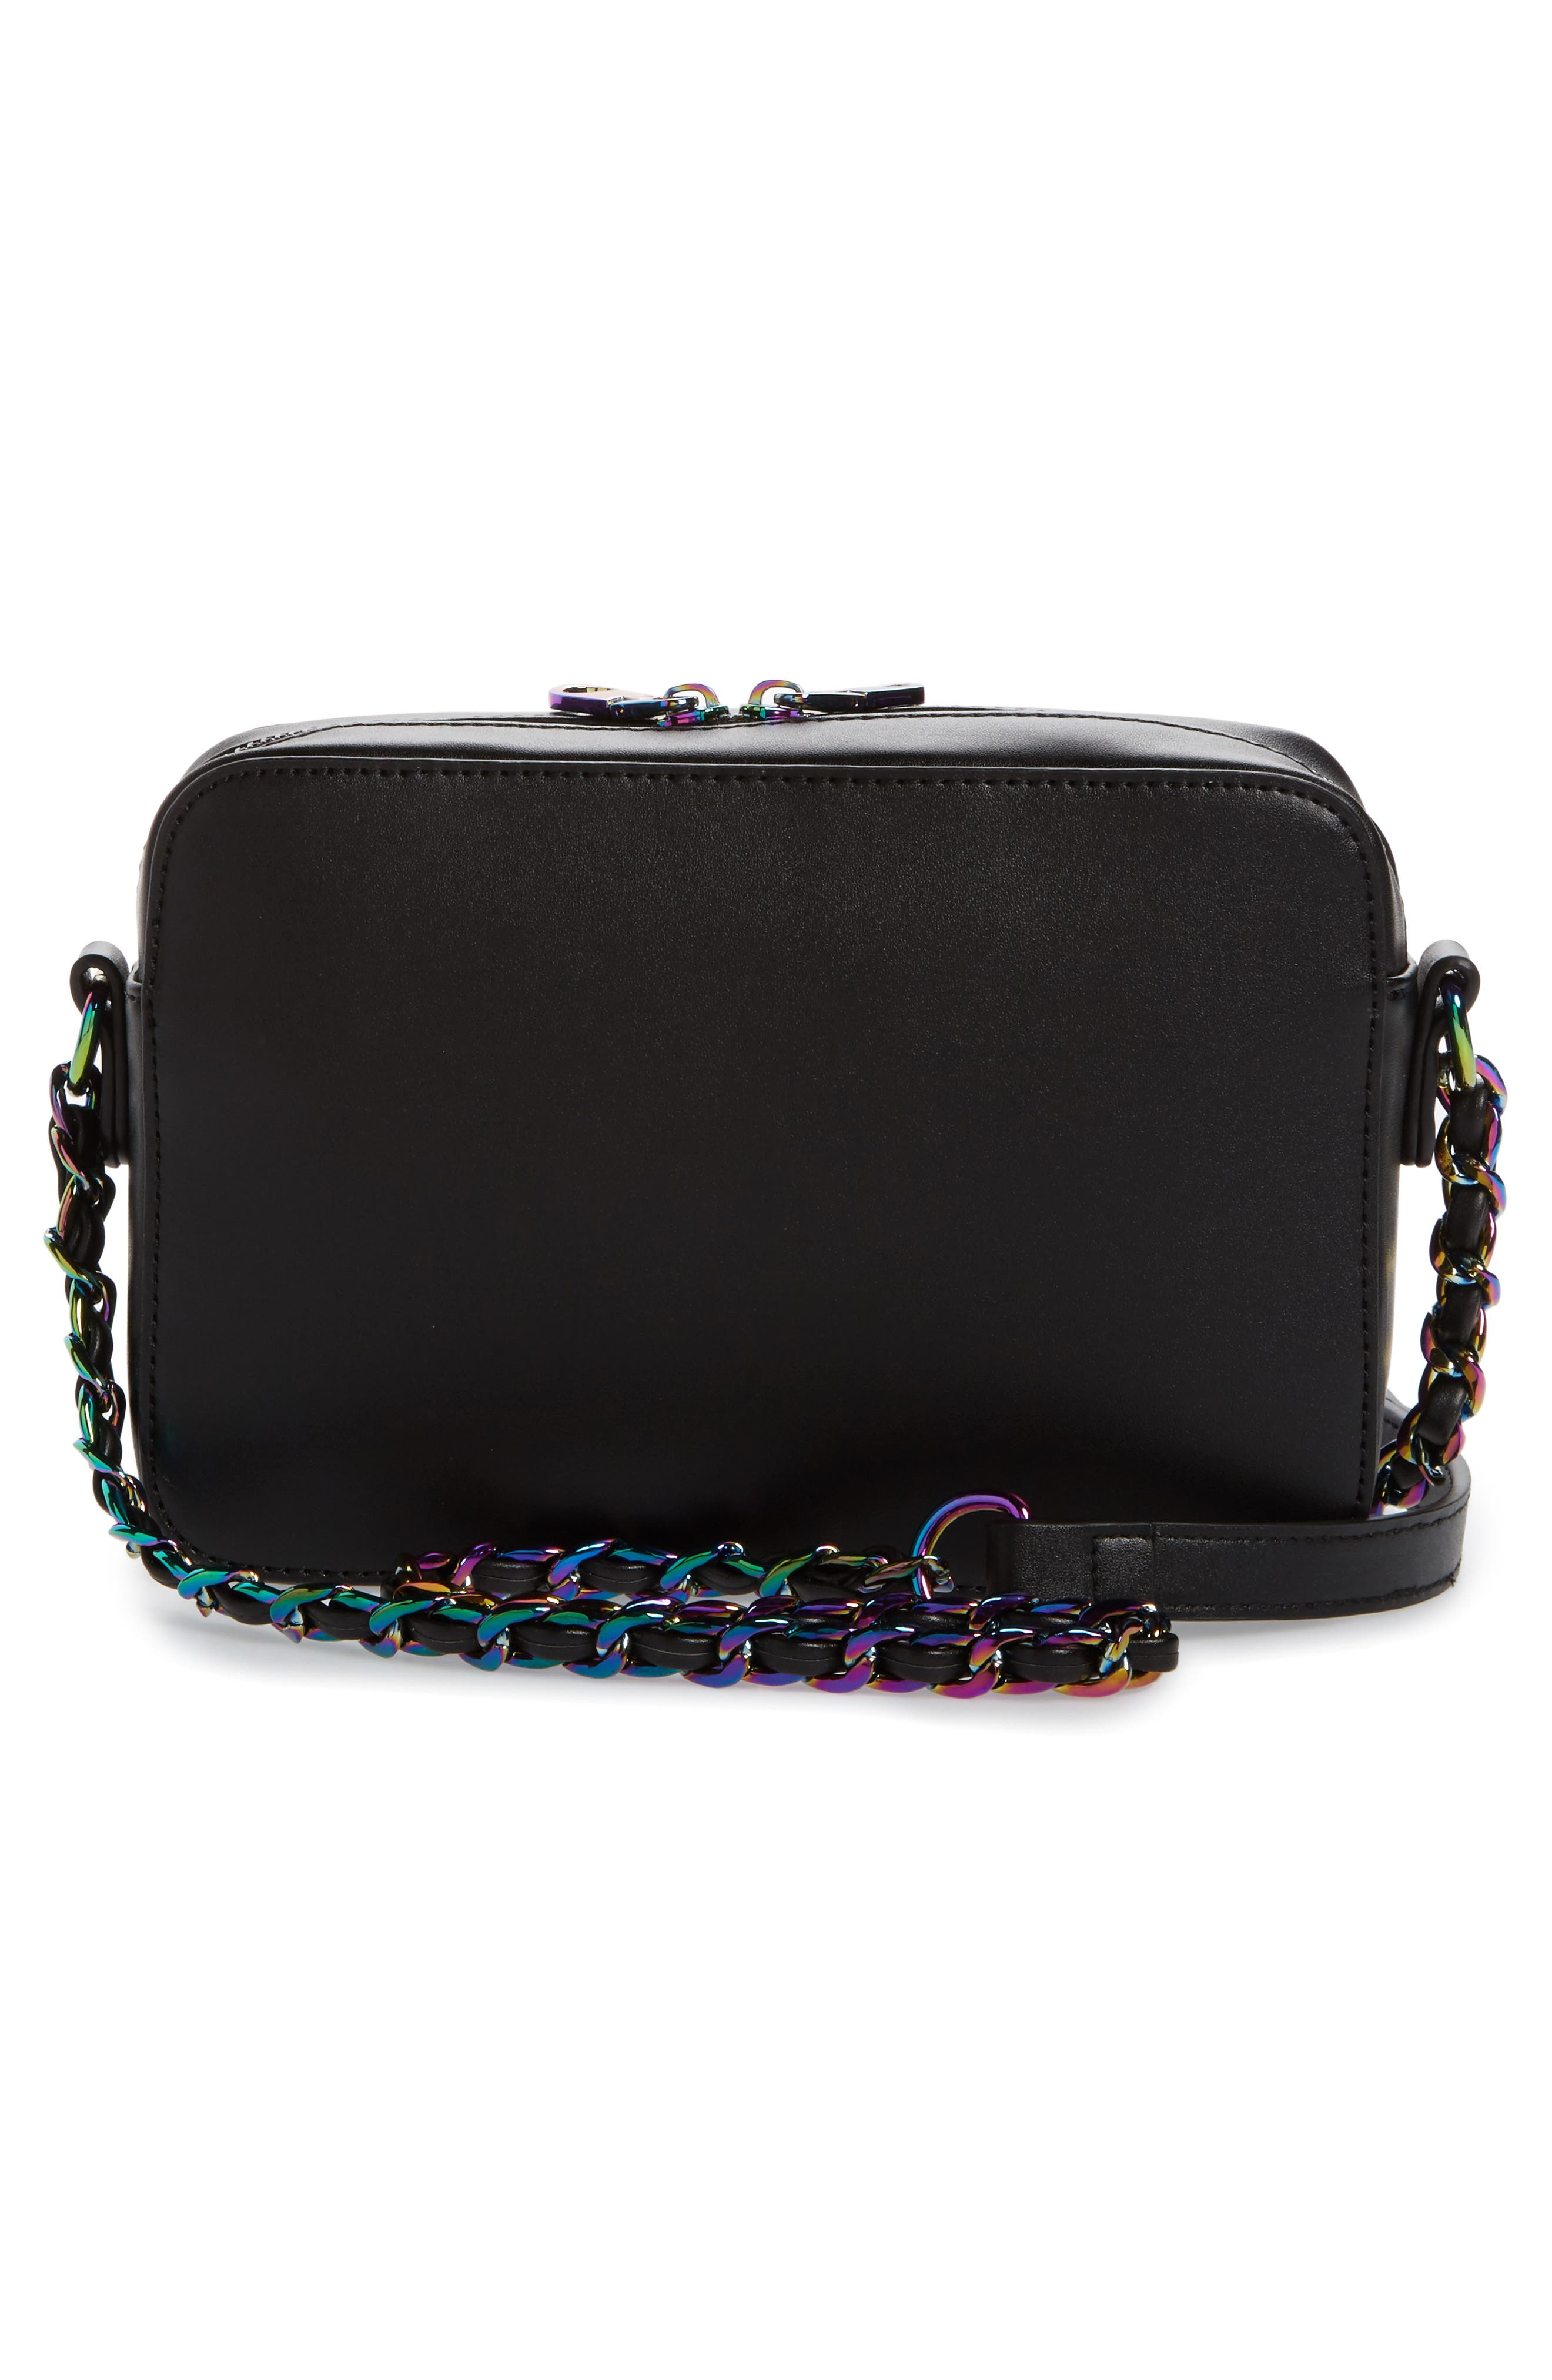 Bella Glitter Star Faux Leather Crossbody Bag,                             Alternate thumbnail 3, color,